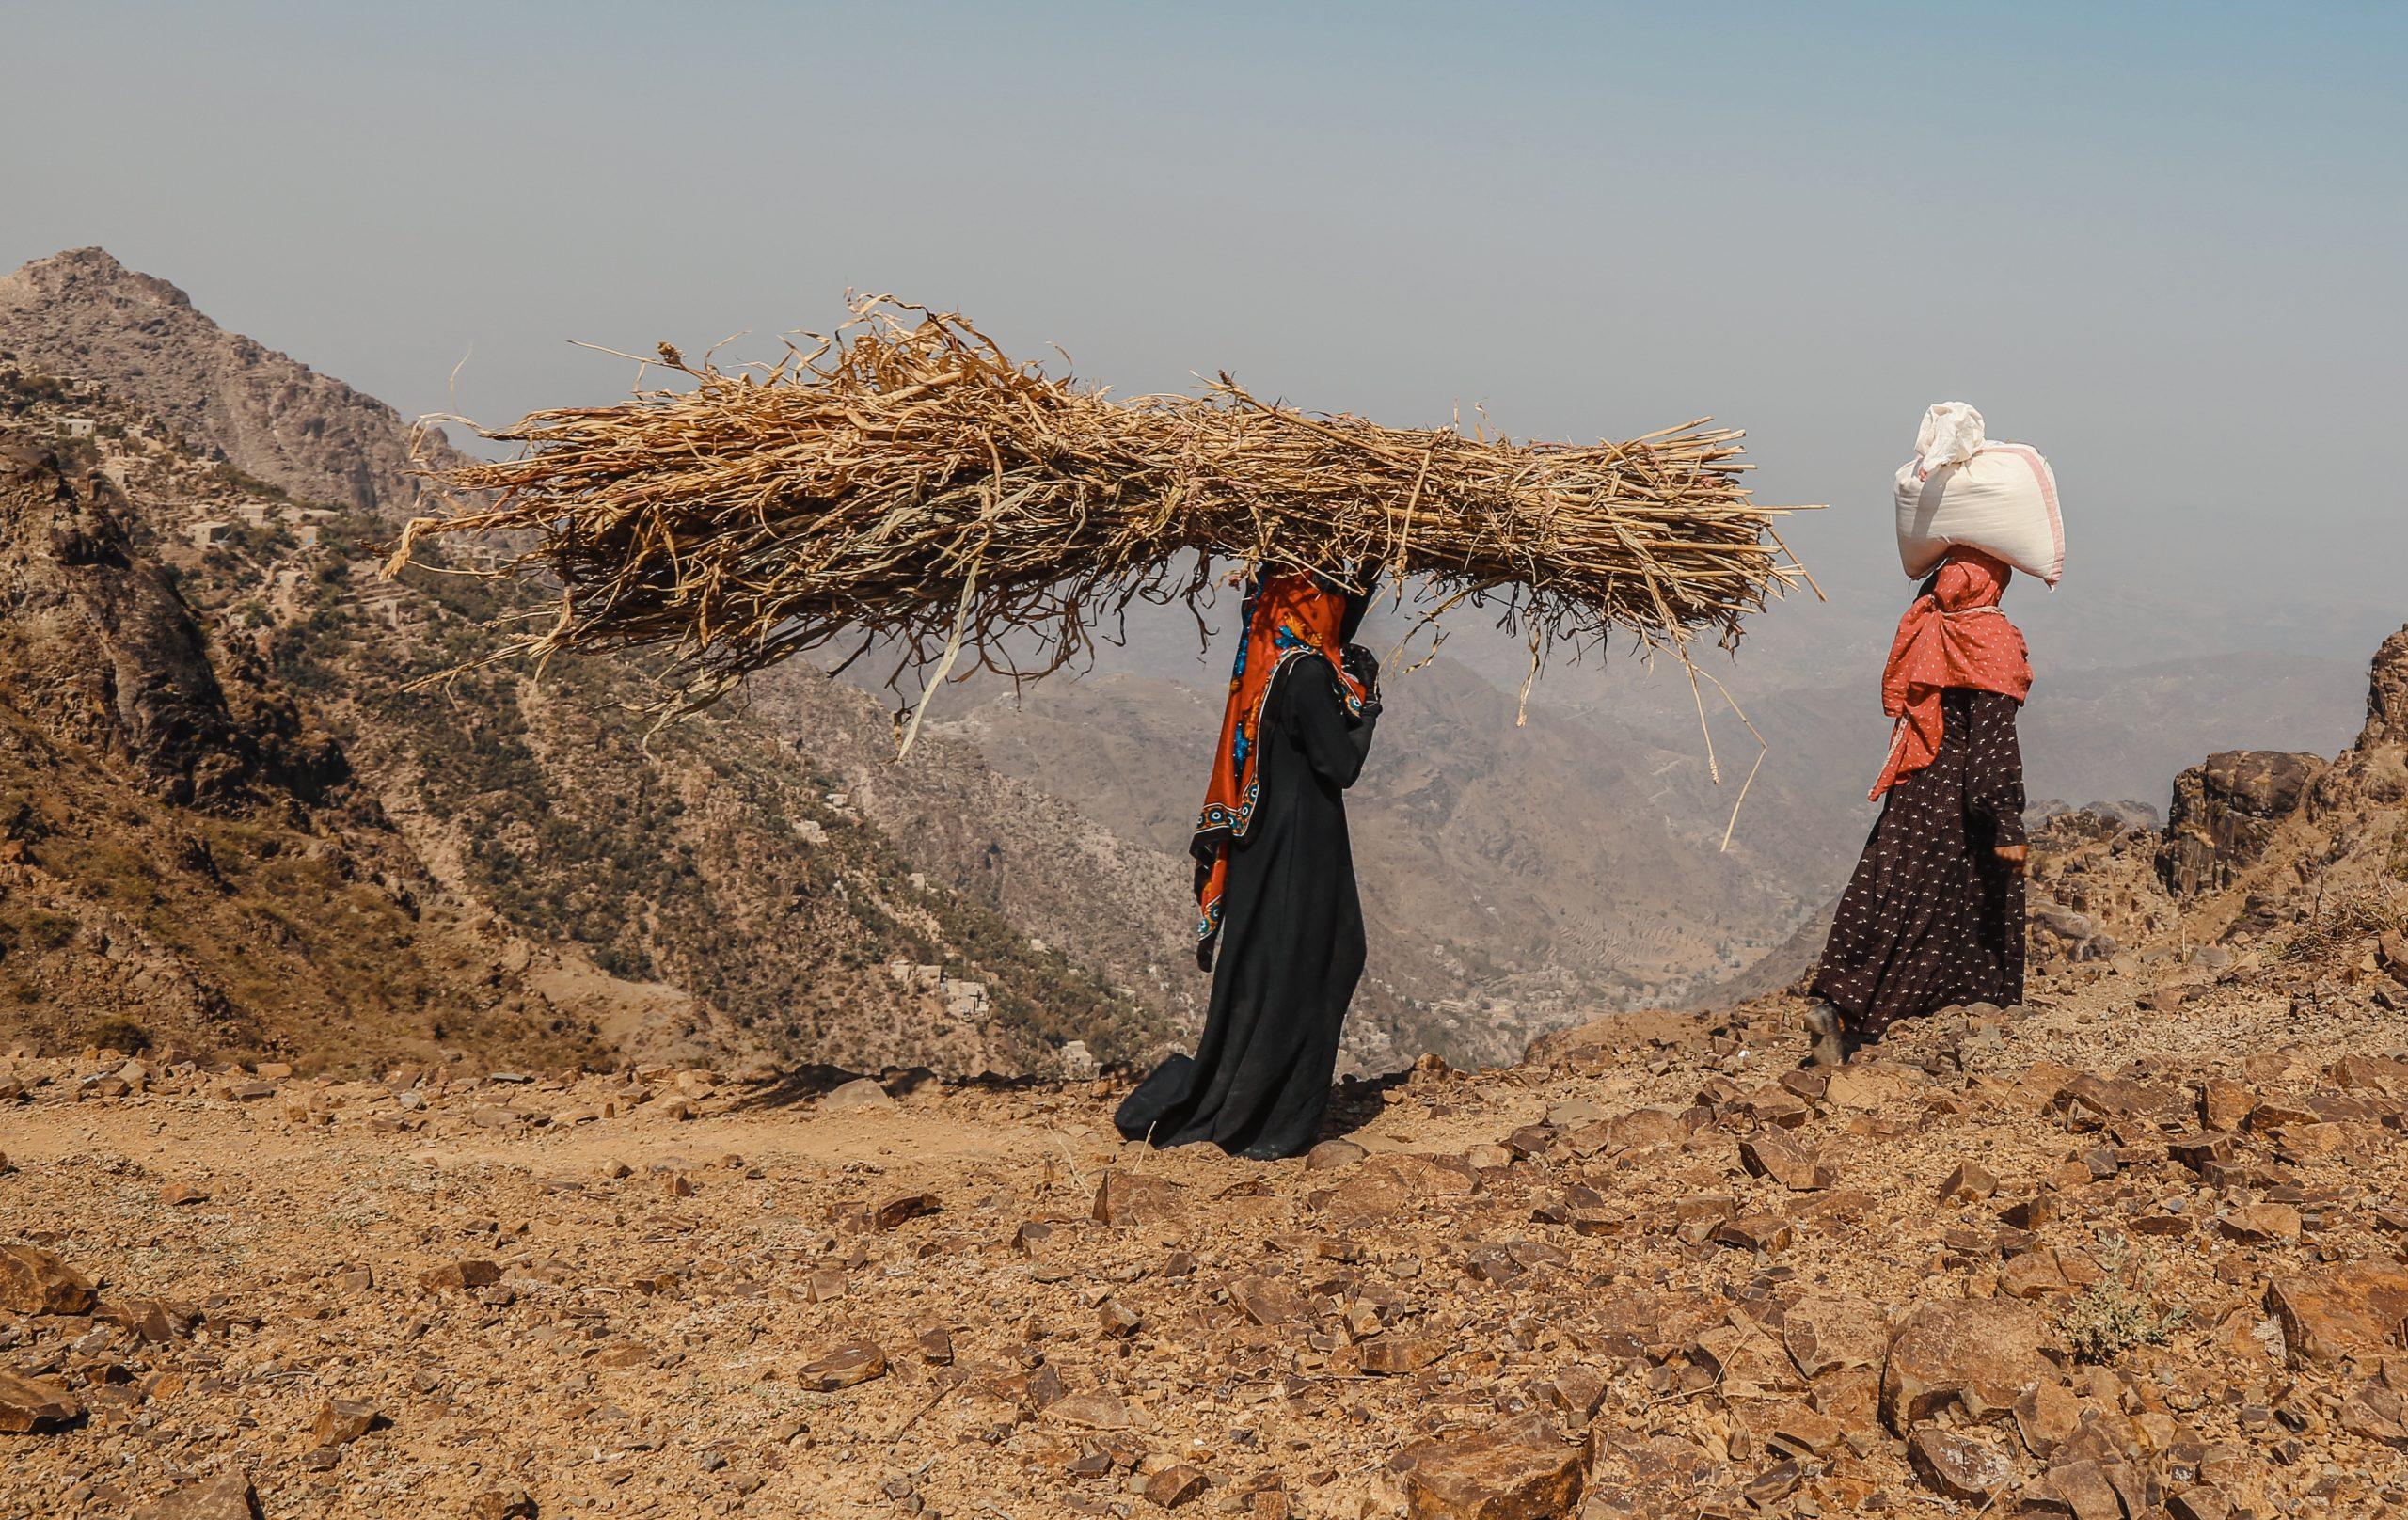 Rural Development is Key to Sustainable Peace in Yemen